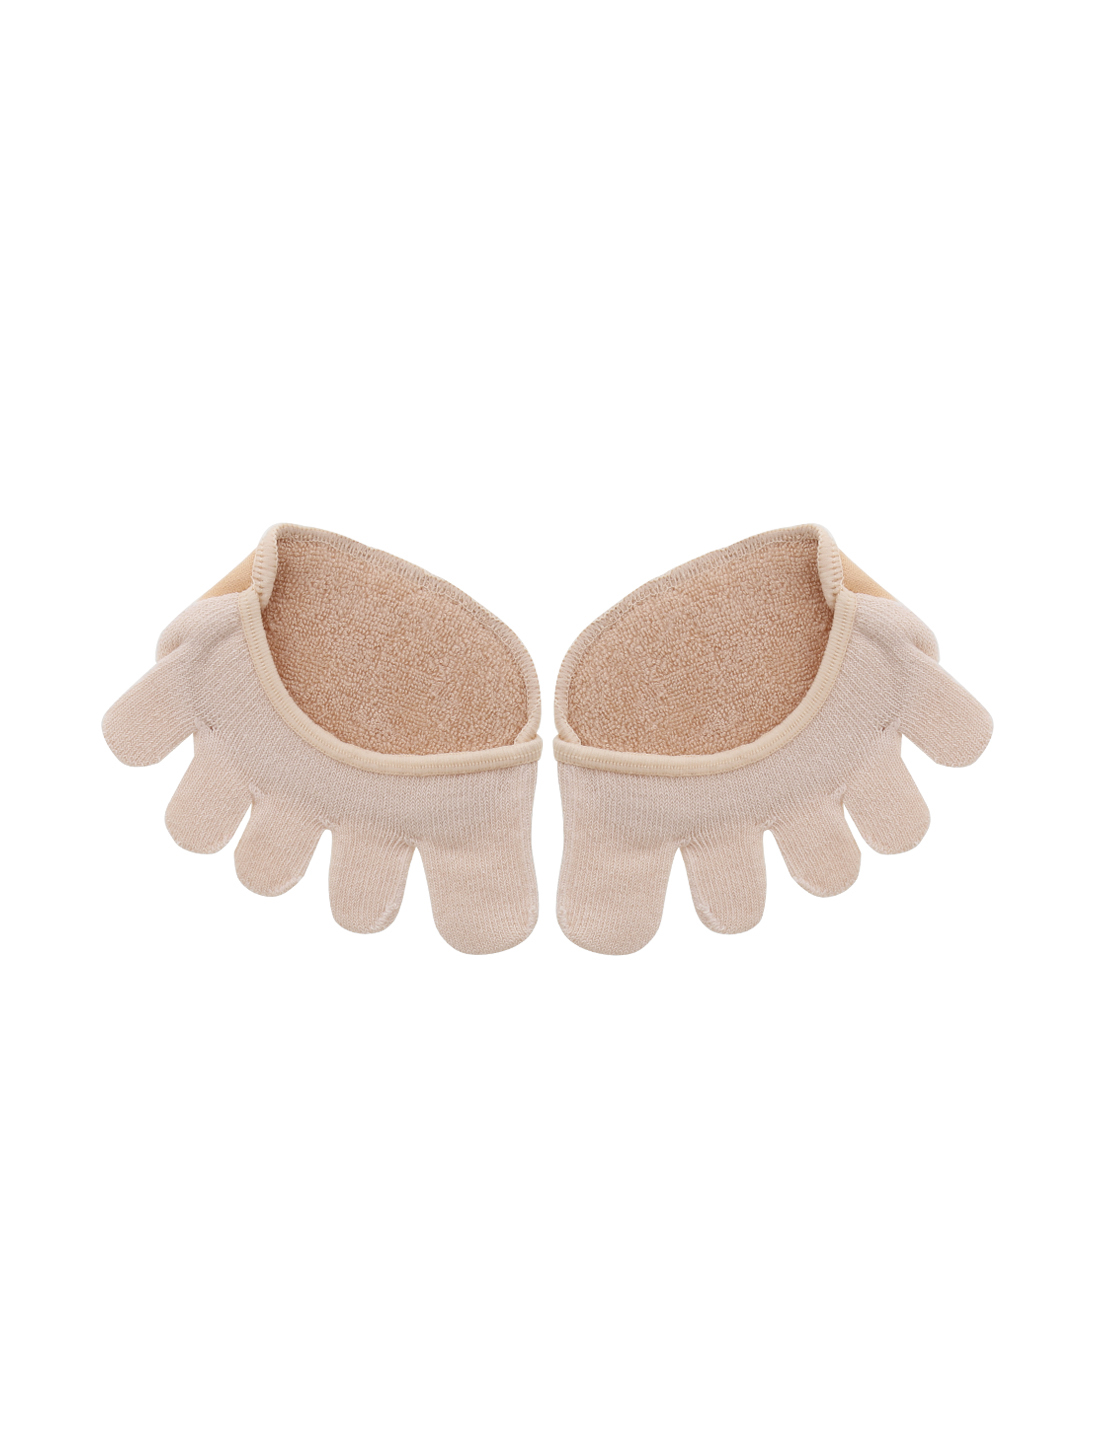 Unisex No Show Yoga Heelless Half Toe Socks 1 pair Beige-2 One Size